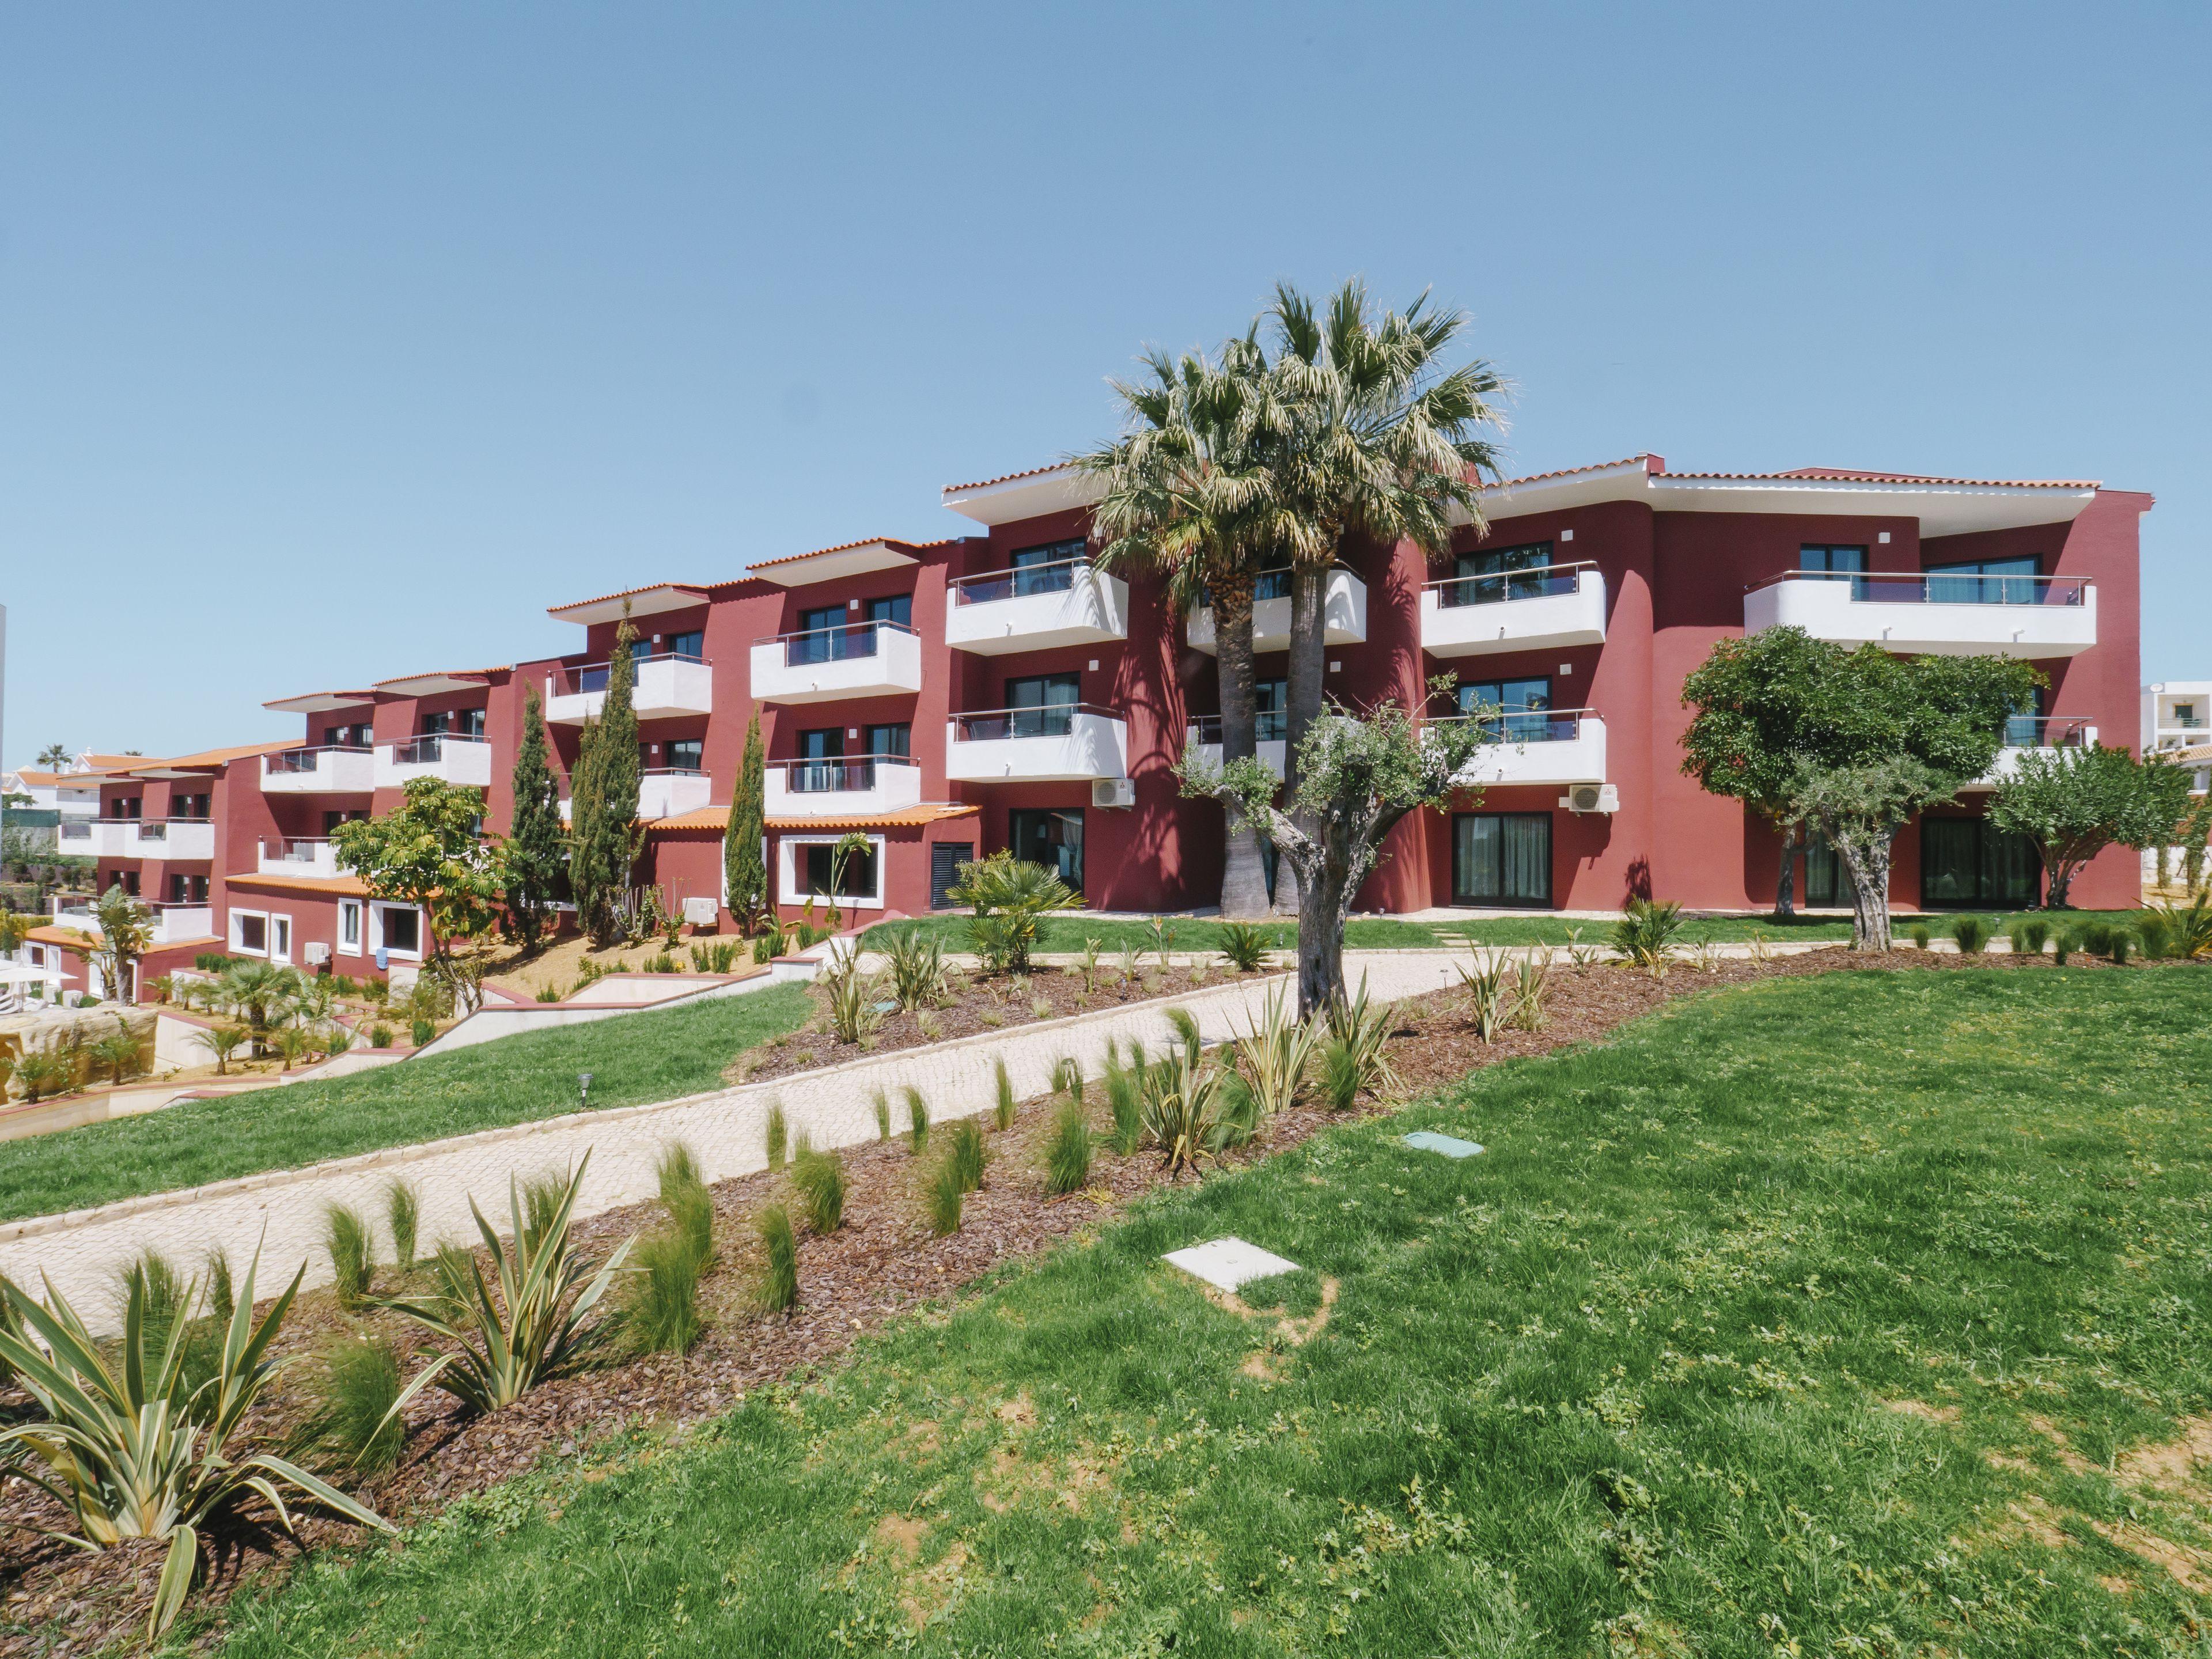 Courtesy of Topazio Mar Beach Hotel & Apartments / Expedia